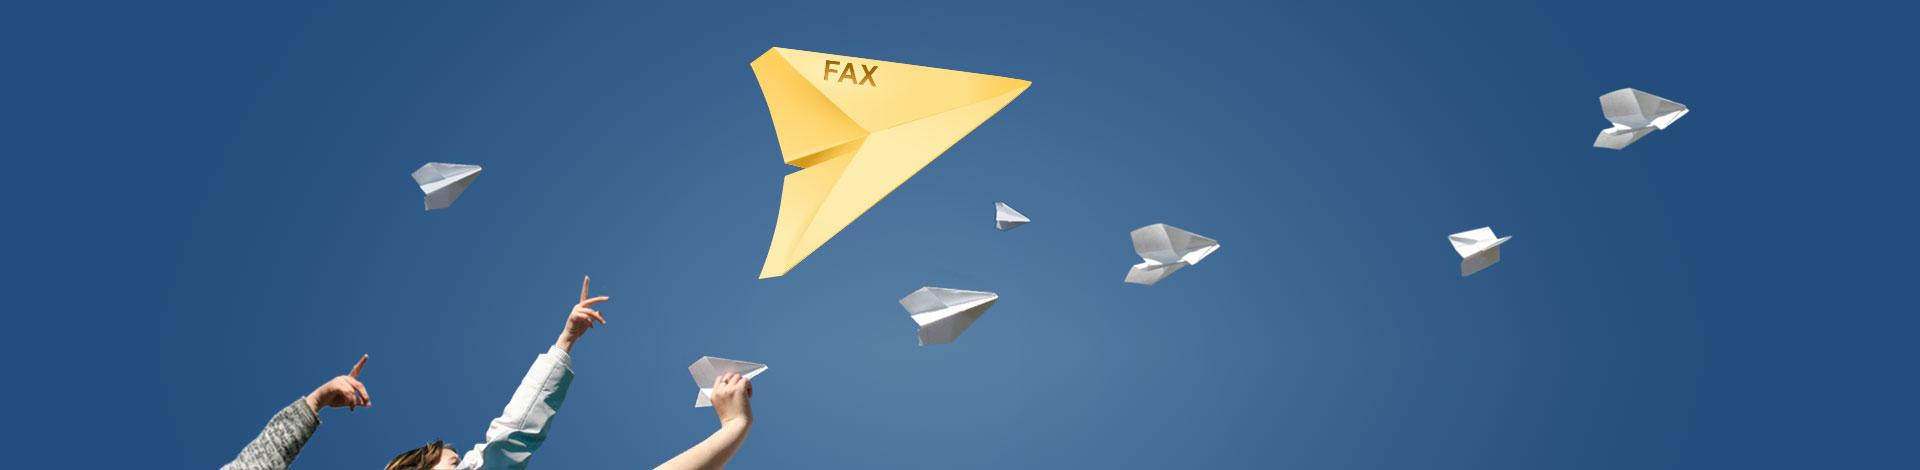 Fax broadcast